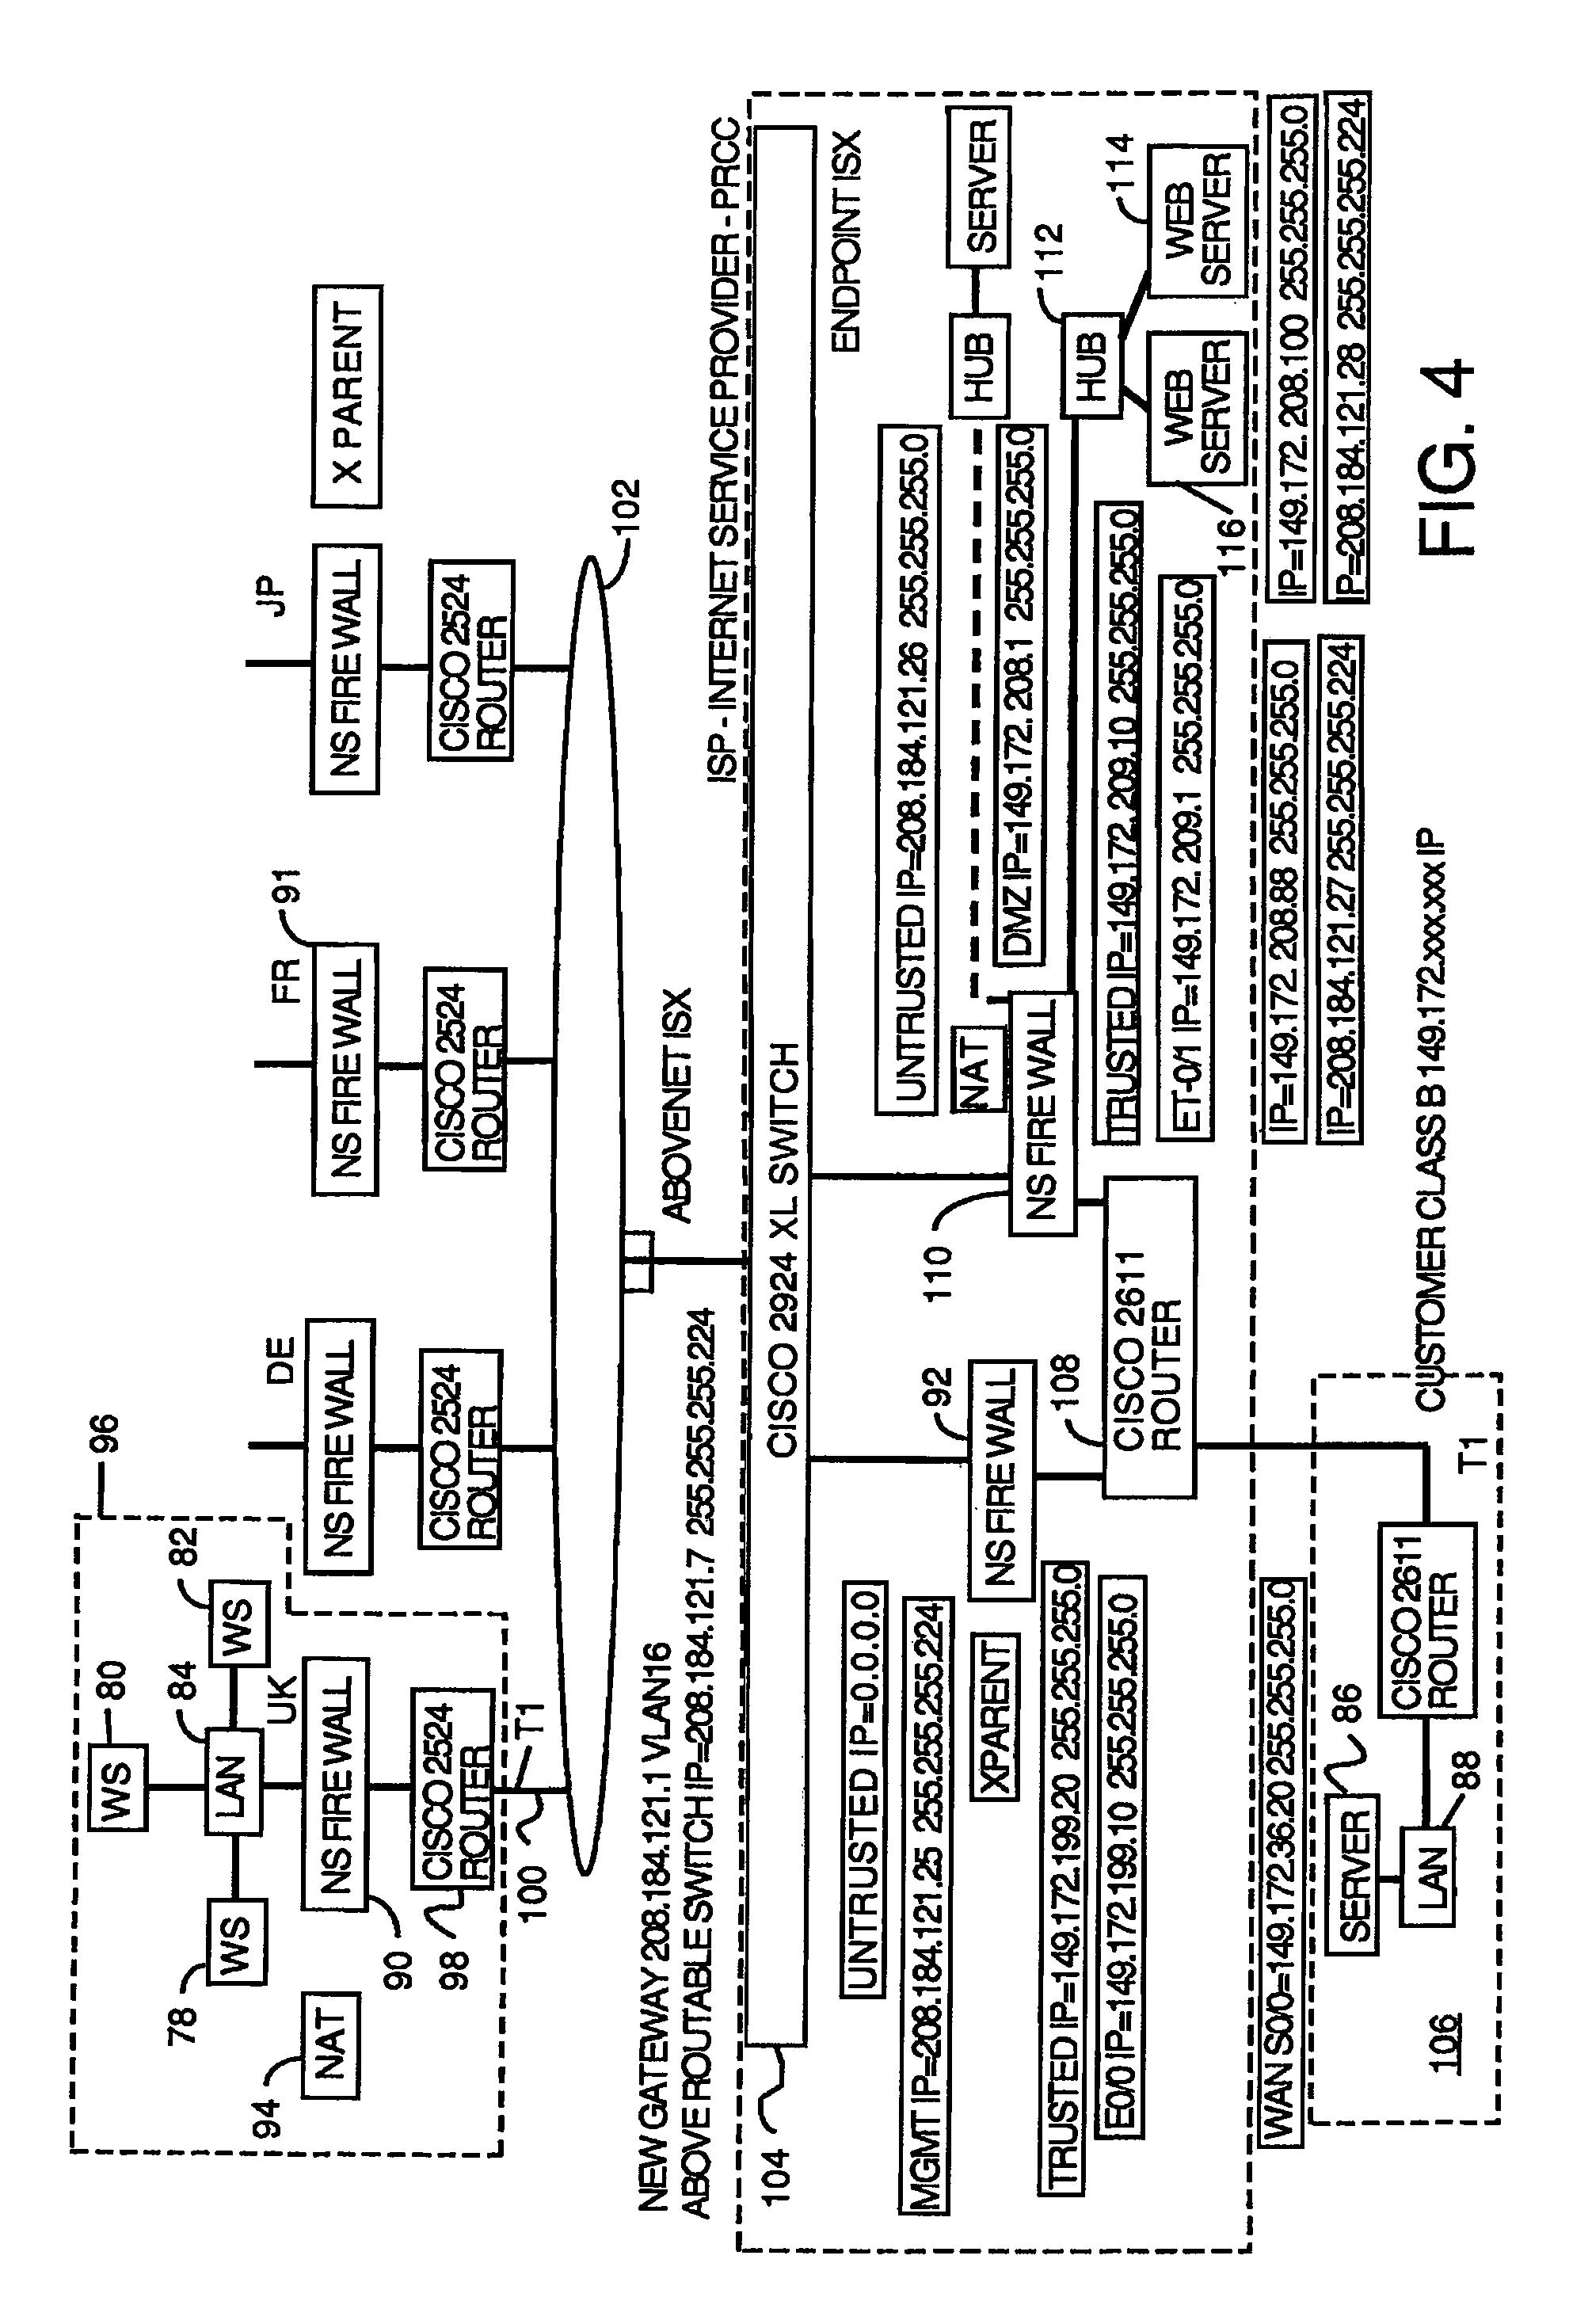 Patent US 9,525,620 B2